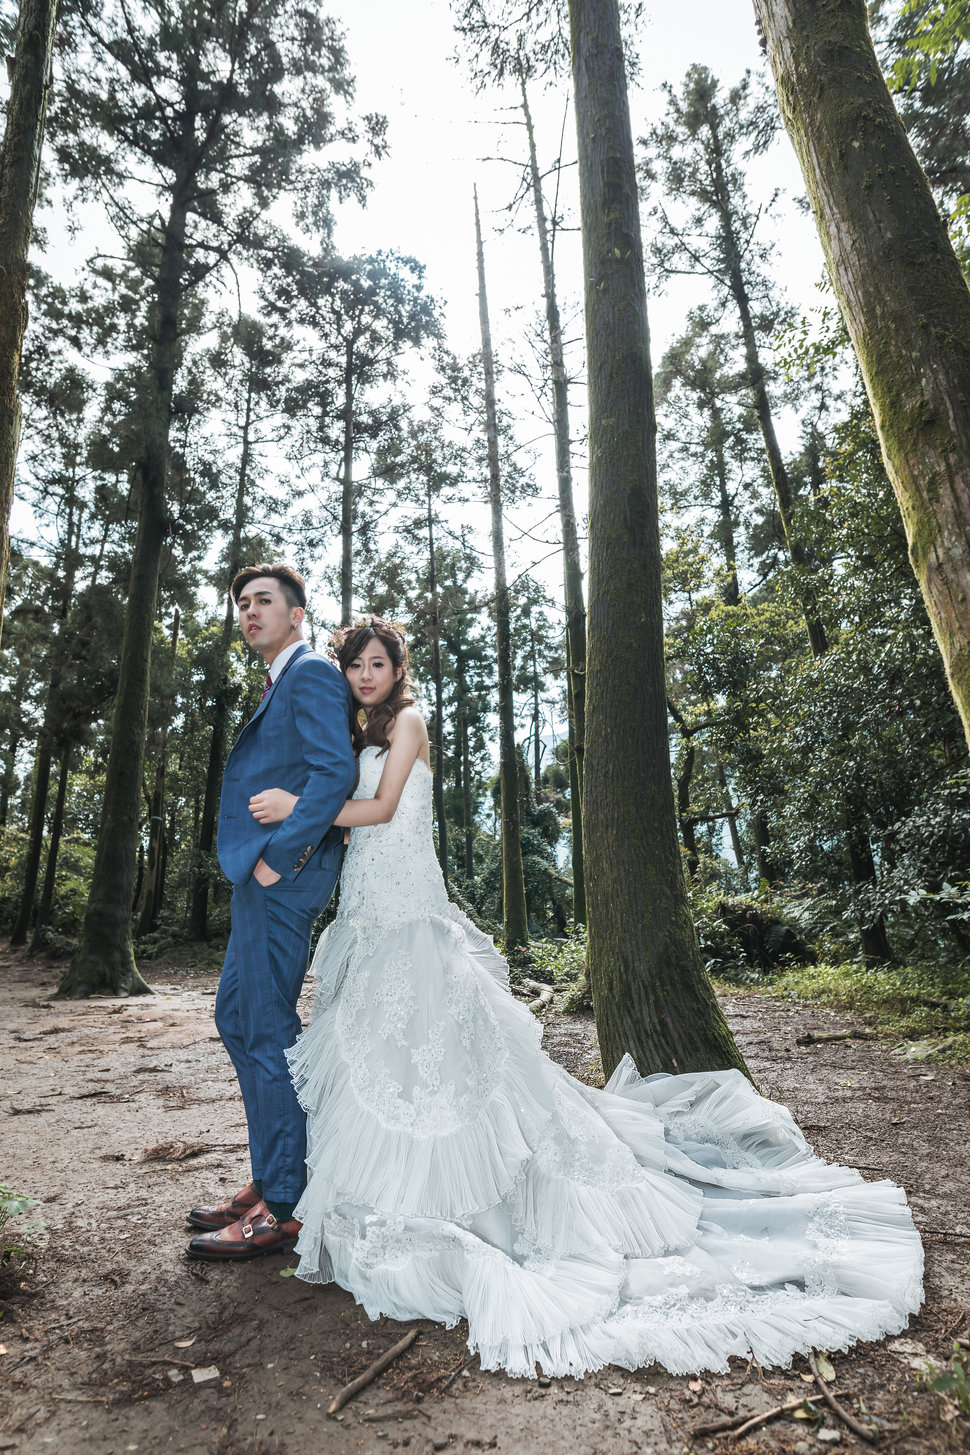 5D4_7256 - Promaker婚禮紀錄攝影團隊婚攝豪哥《結婚吧》